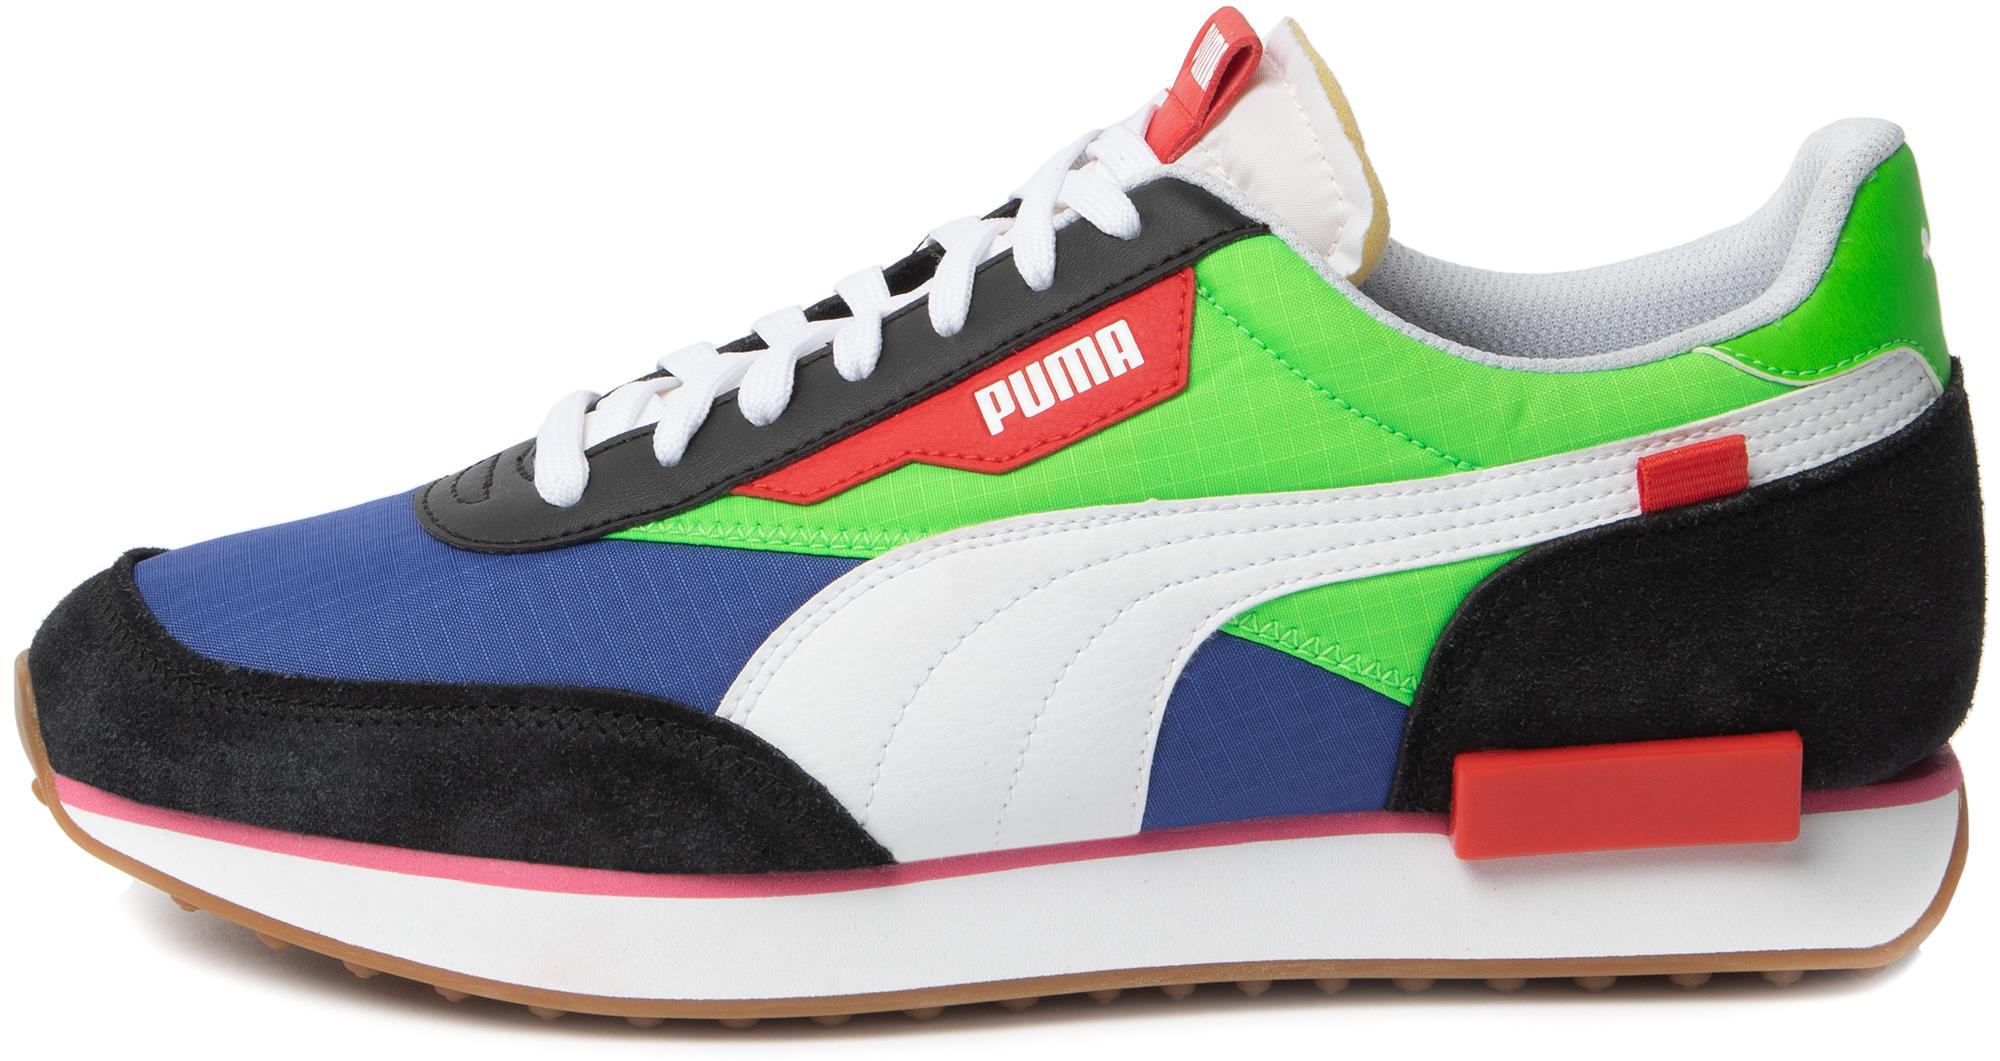 Puma Кроссовки мужские Puma Rider Play On, размер 45 puma кроссовки мужские puma ember trl demi размер 45